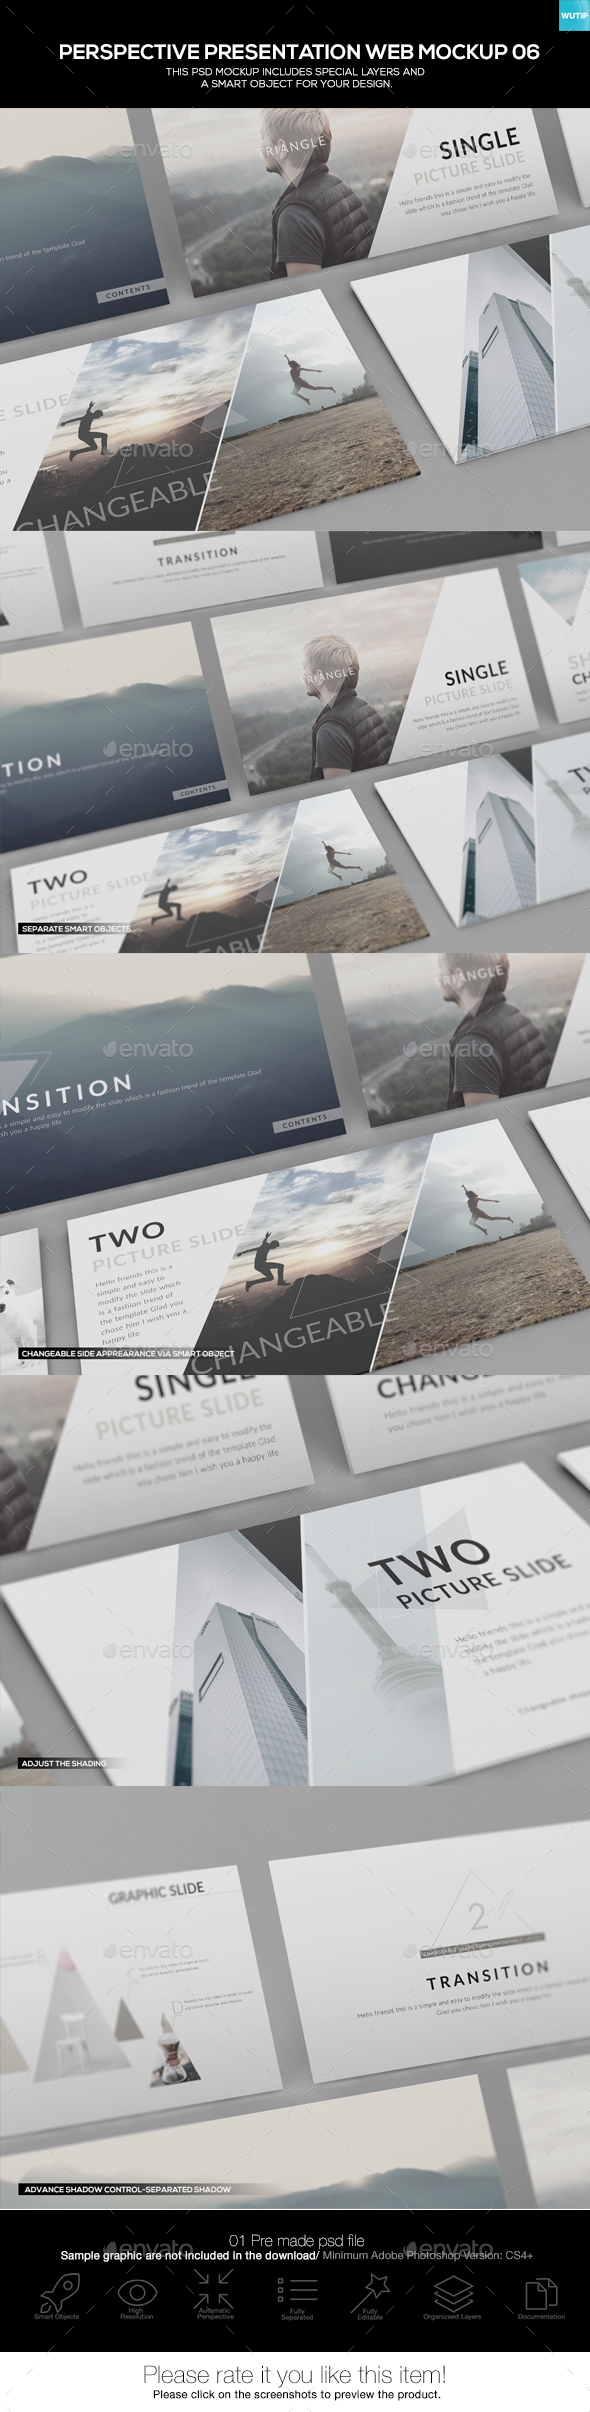 Perspective Presentation Web Mockup 06 - Website Displays